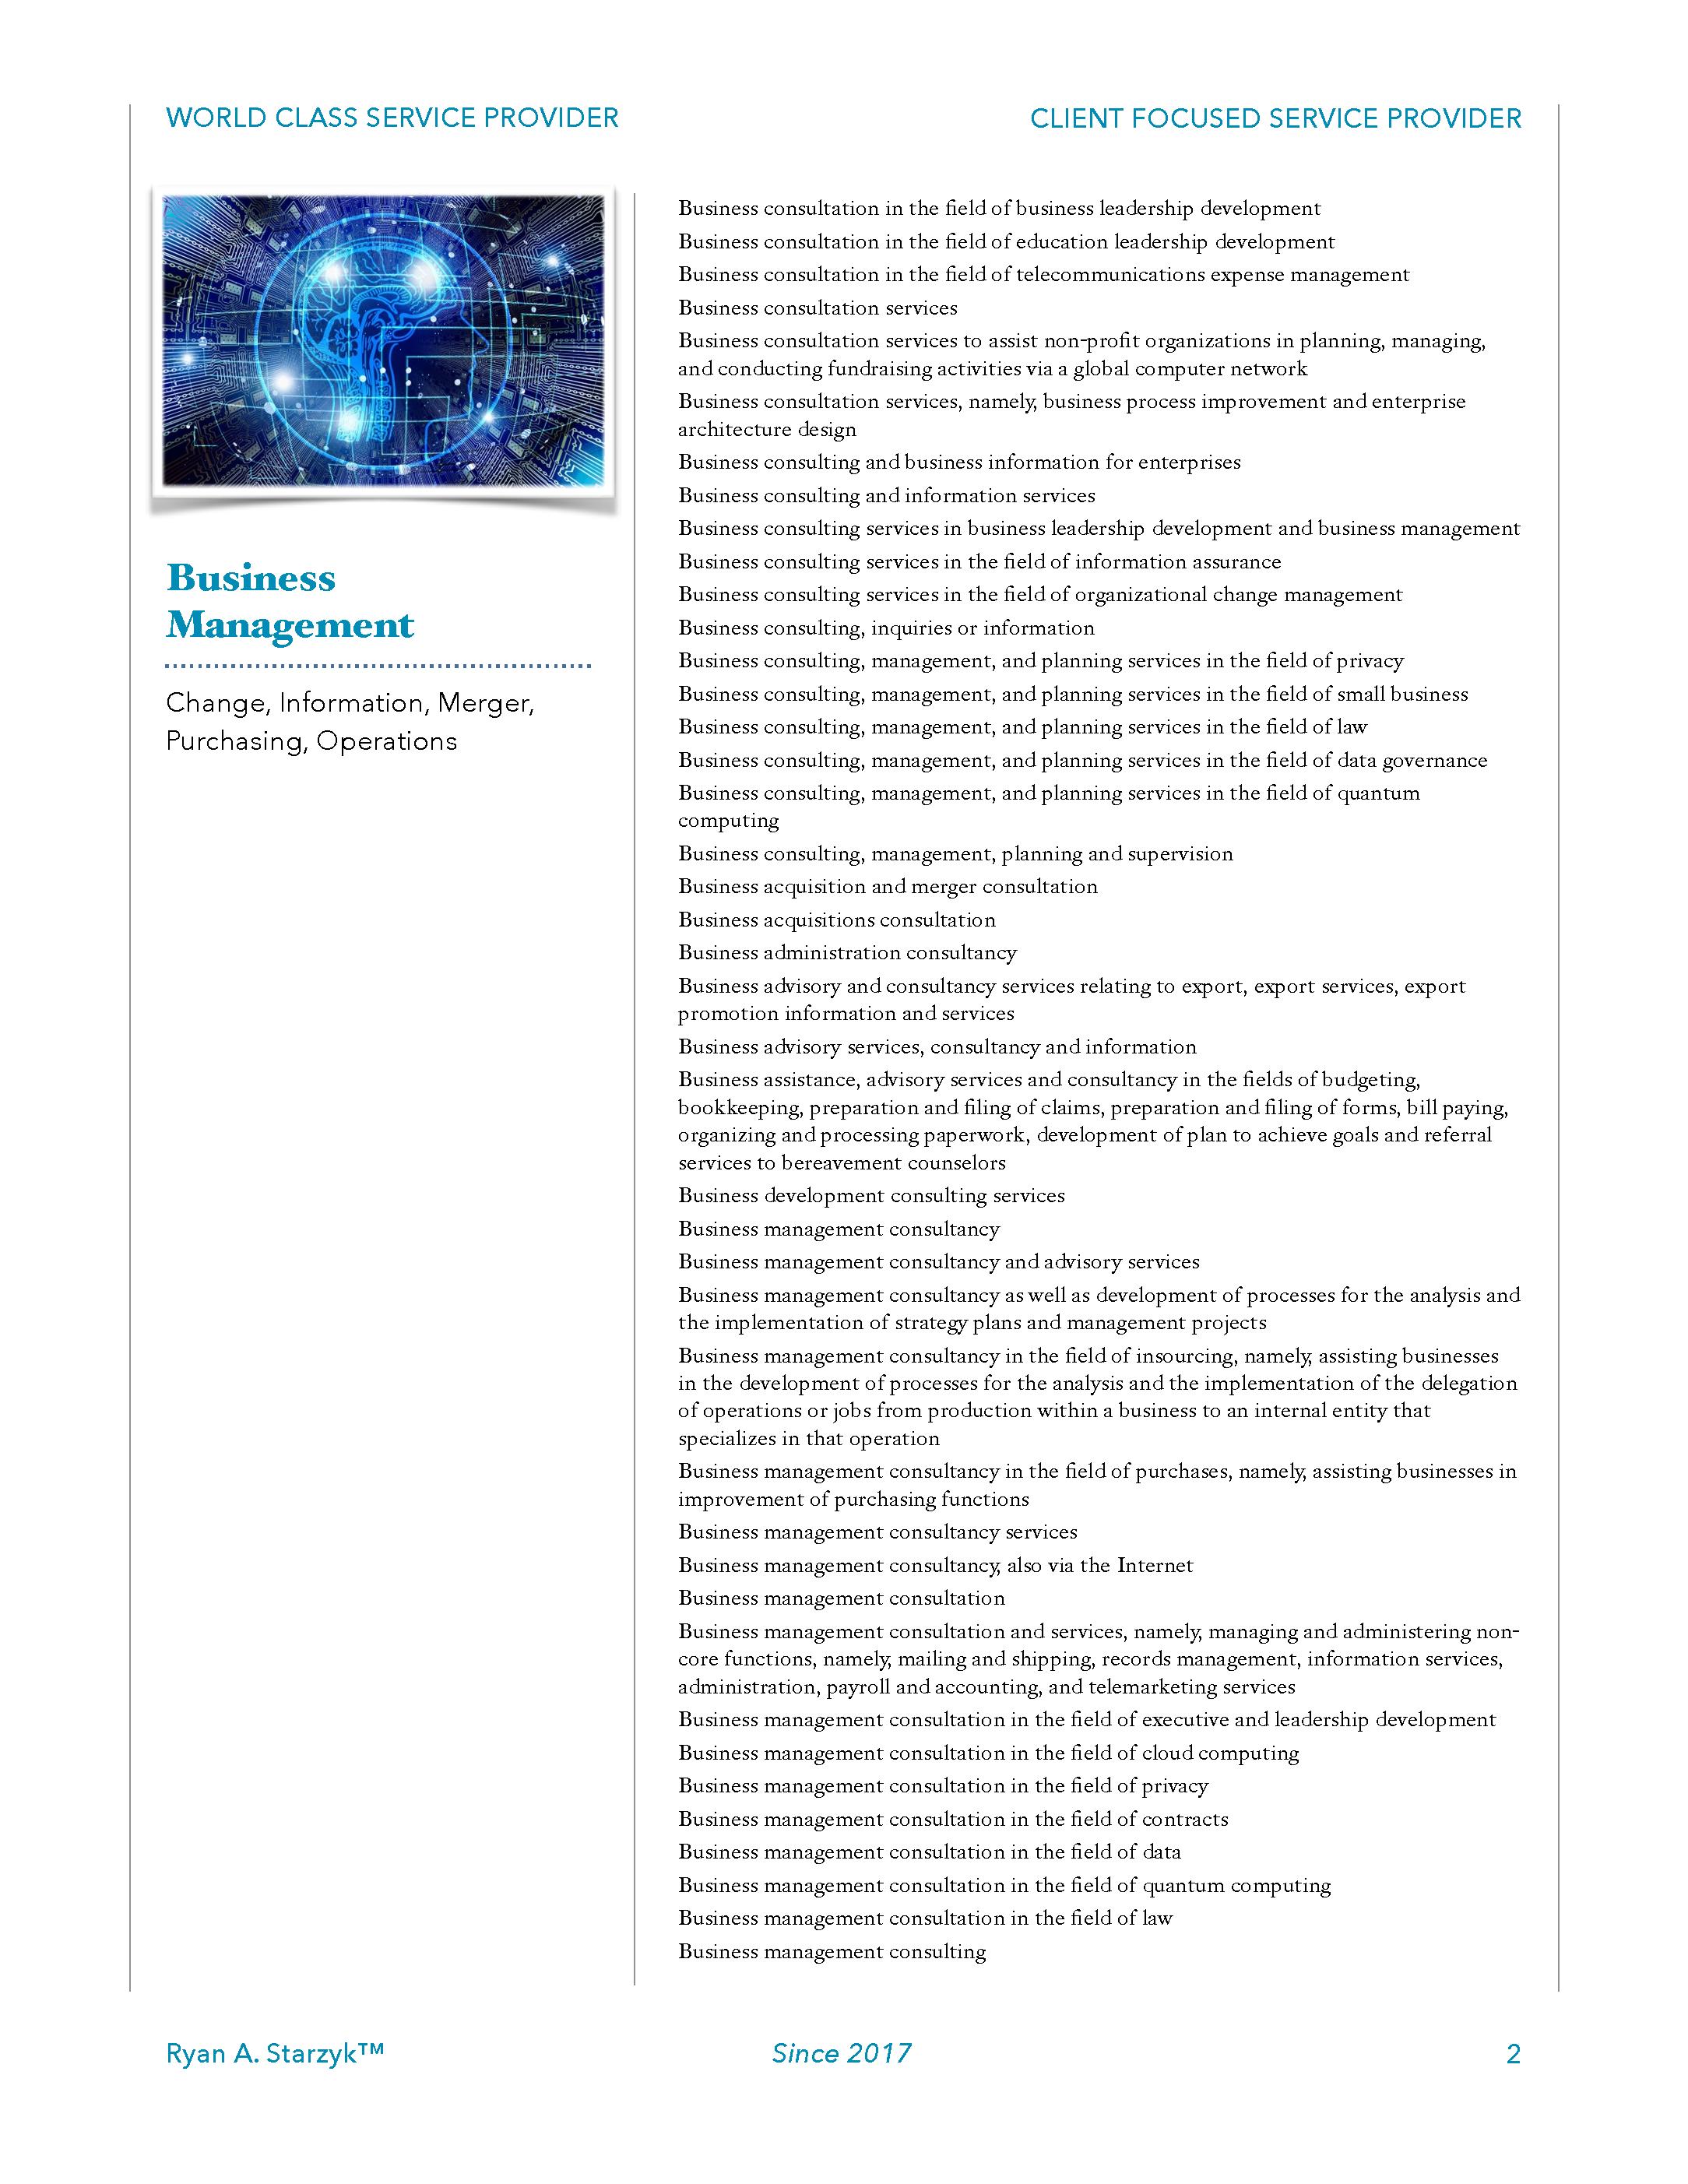 USPTO-RAS-July 2019_Page_2.png